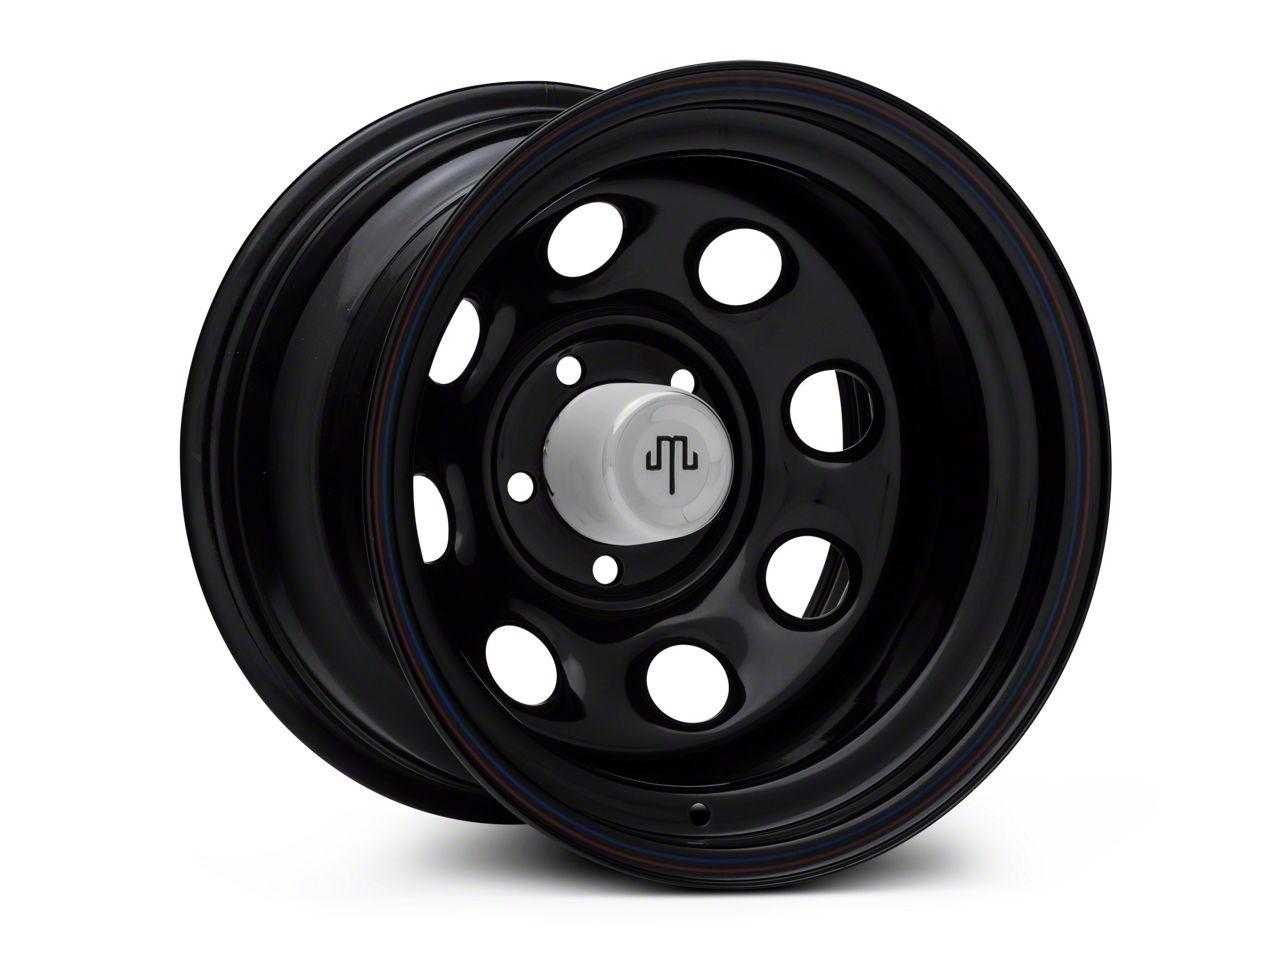 Mammoth 8 Black Wagon Wheel Edition Steel 15x10 Wheel & Mickey Thompson Baja MTZP3 31x10.50R15 Tire Kit (87-06 Jeep Wrangler YJ & TJ)